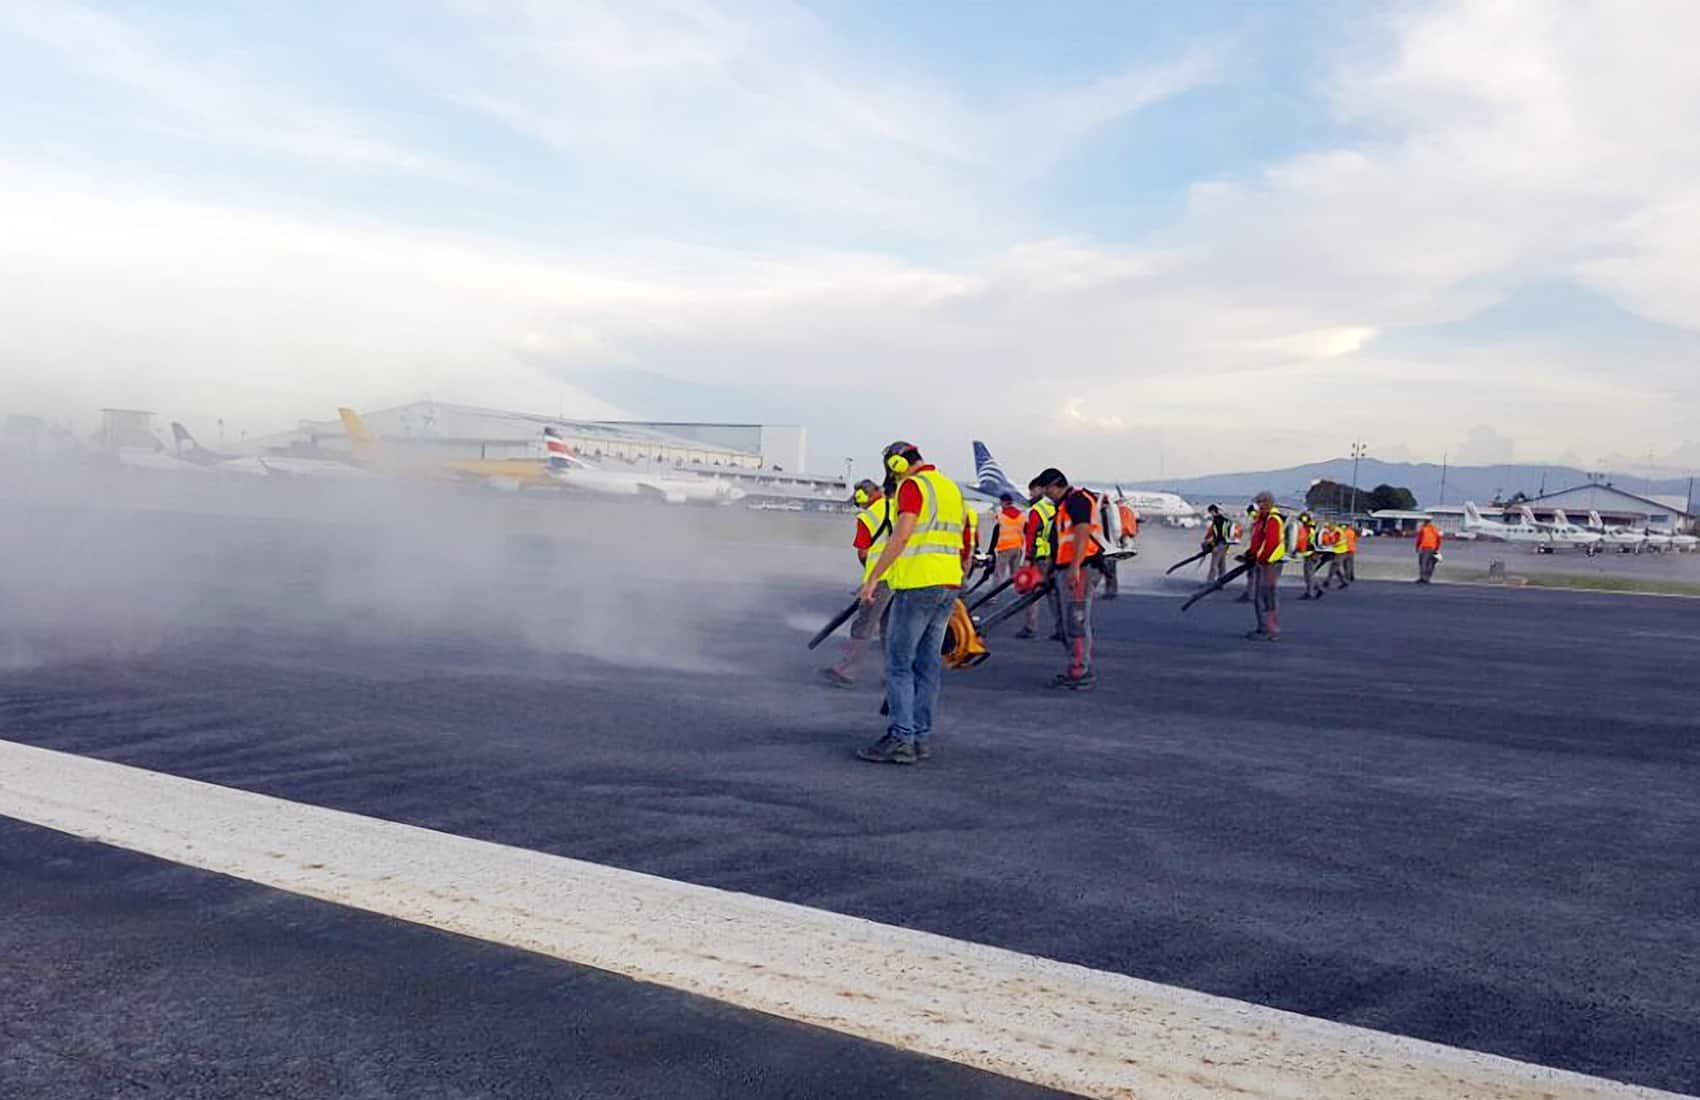 Juan Santamaría International Airport runway